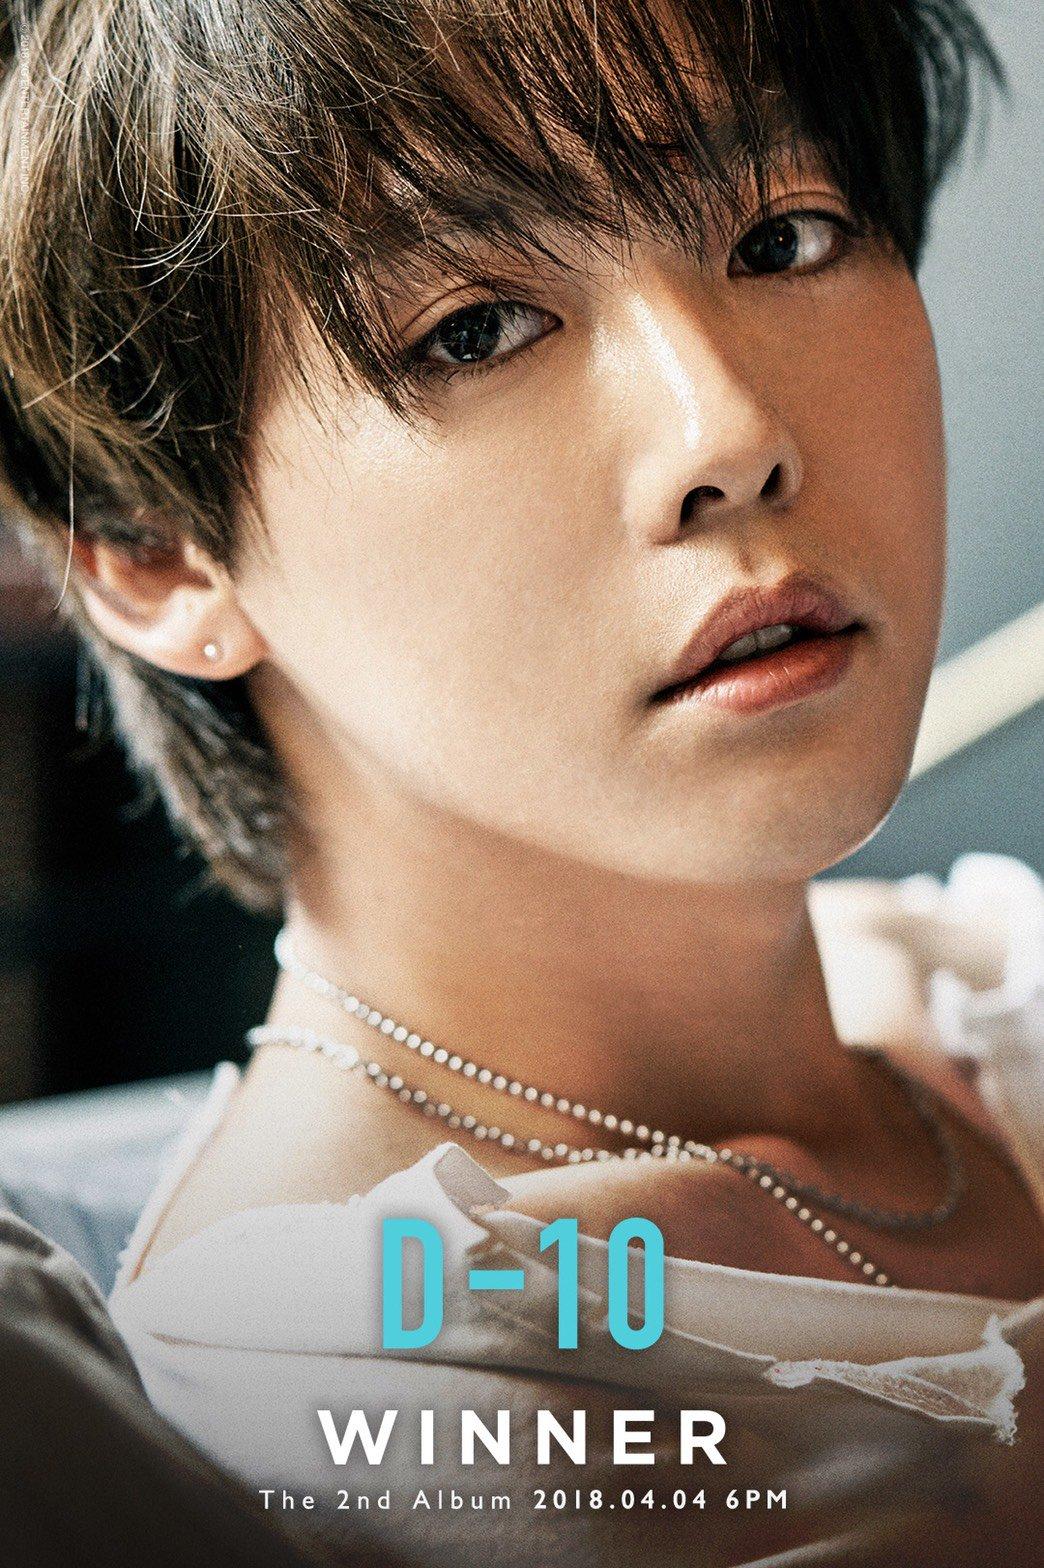 Winner Kim Jin-Woo